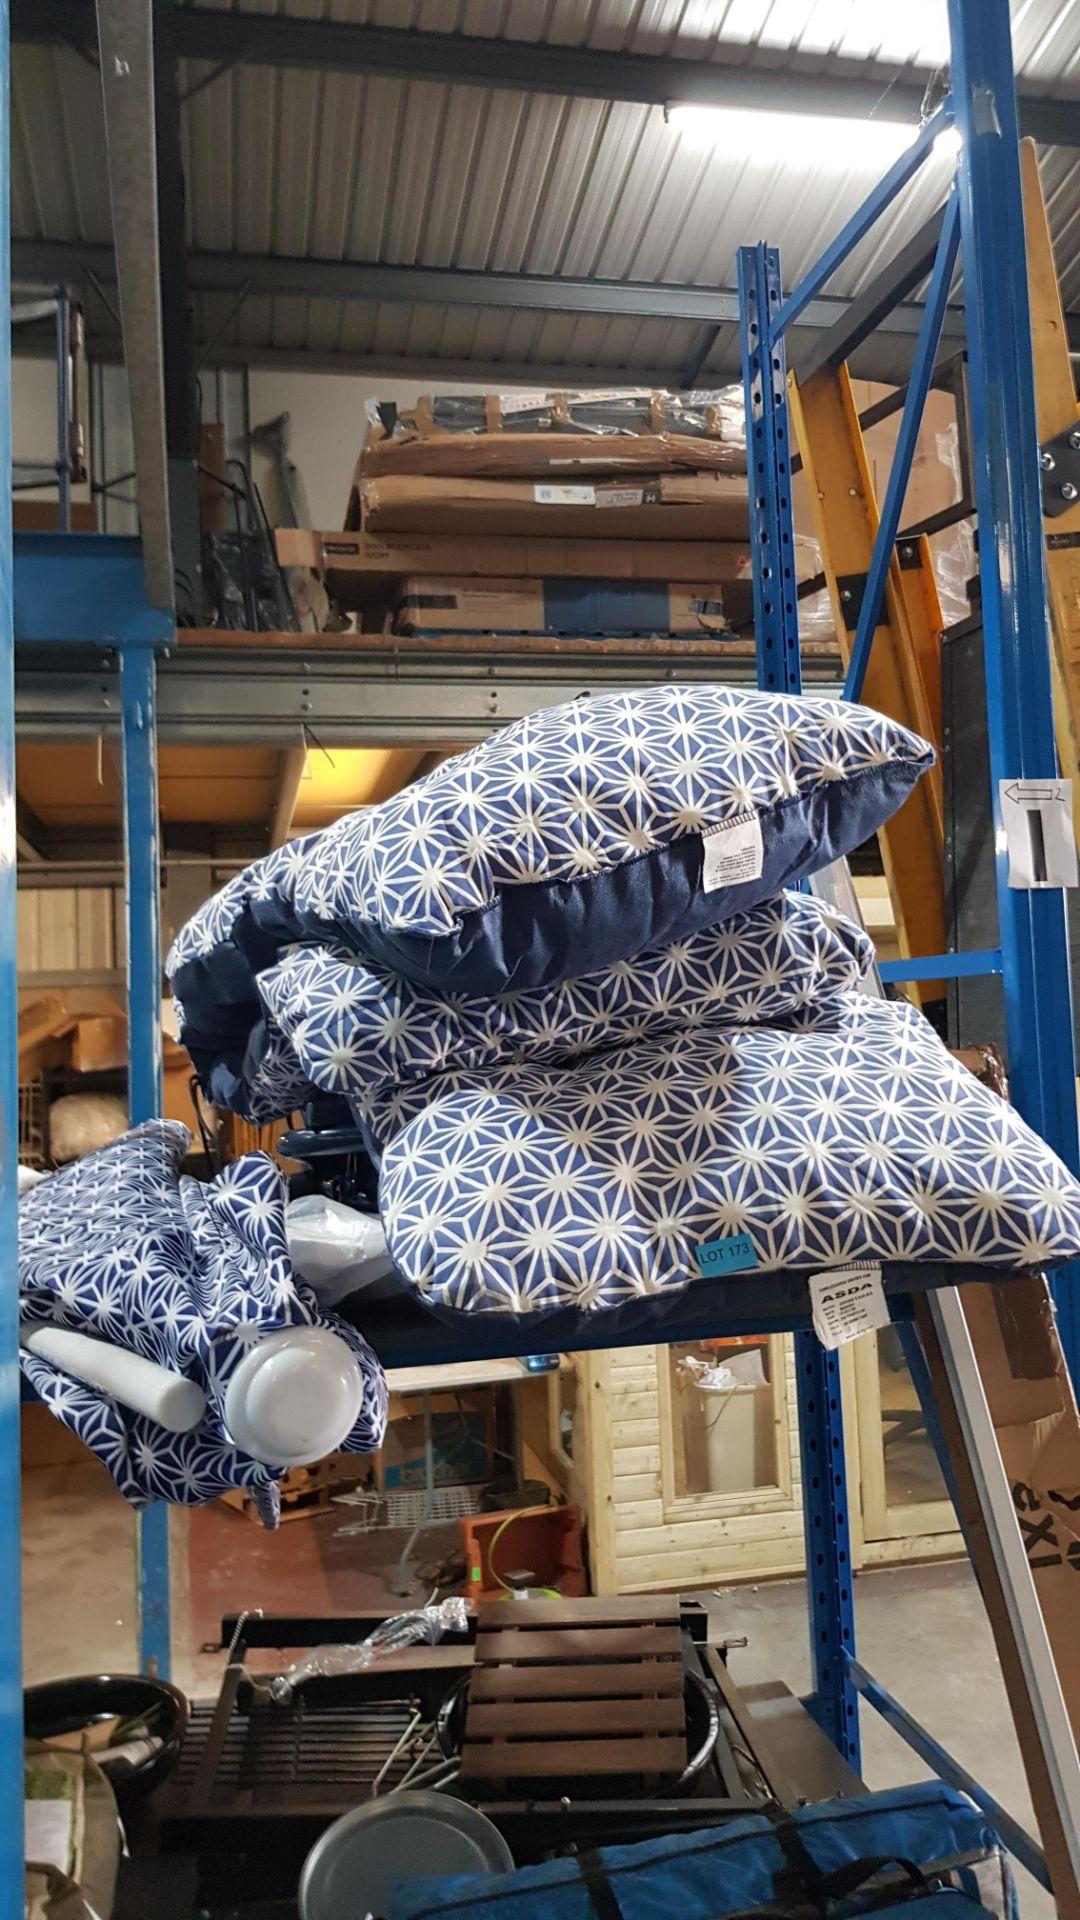 (2I) 3x Items. 2x Blue White Geometric Pattern Garden Recliners & 1x Matching Parasol. - Image 3 of 3